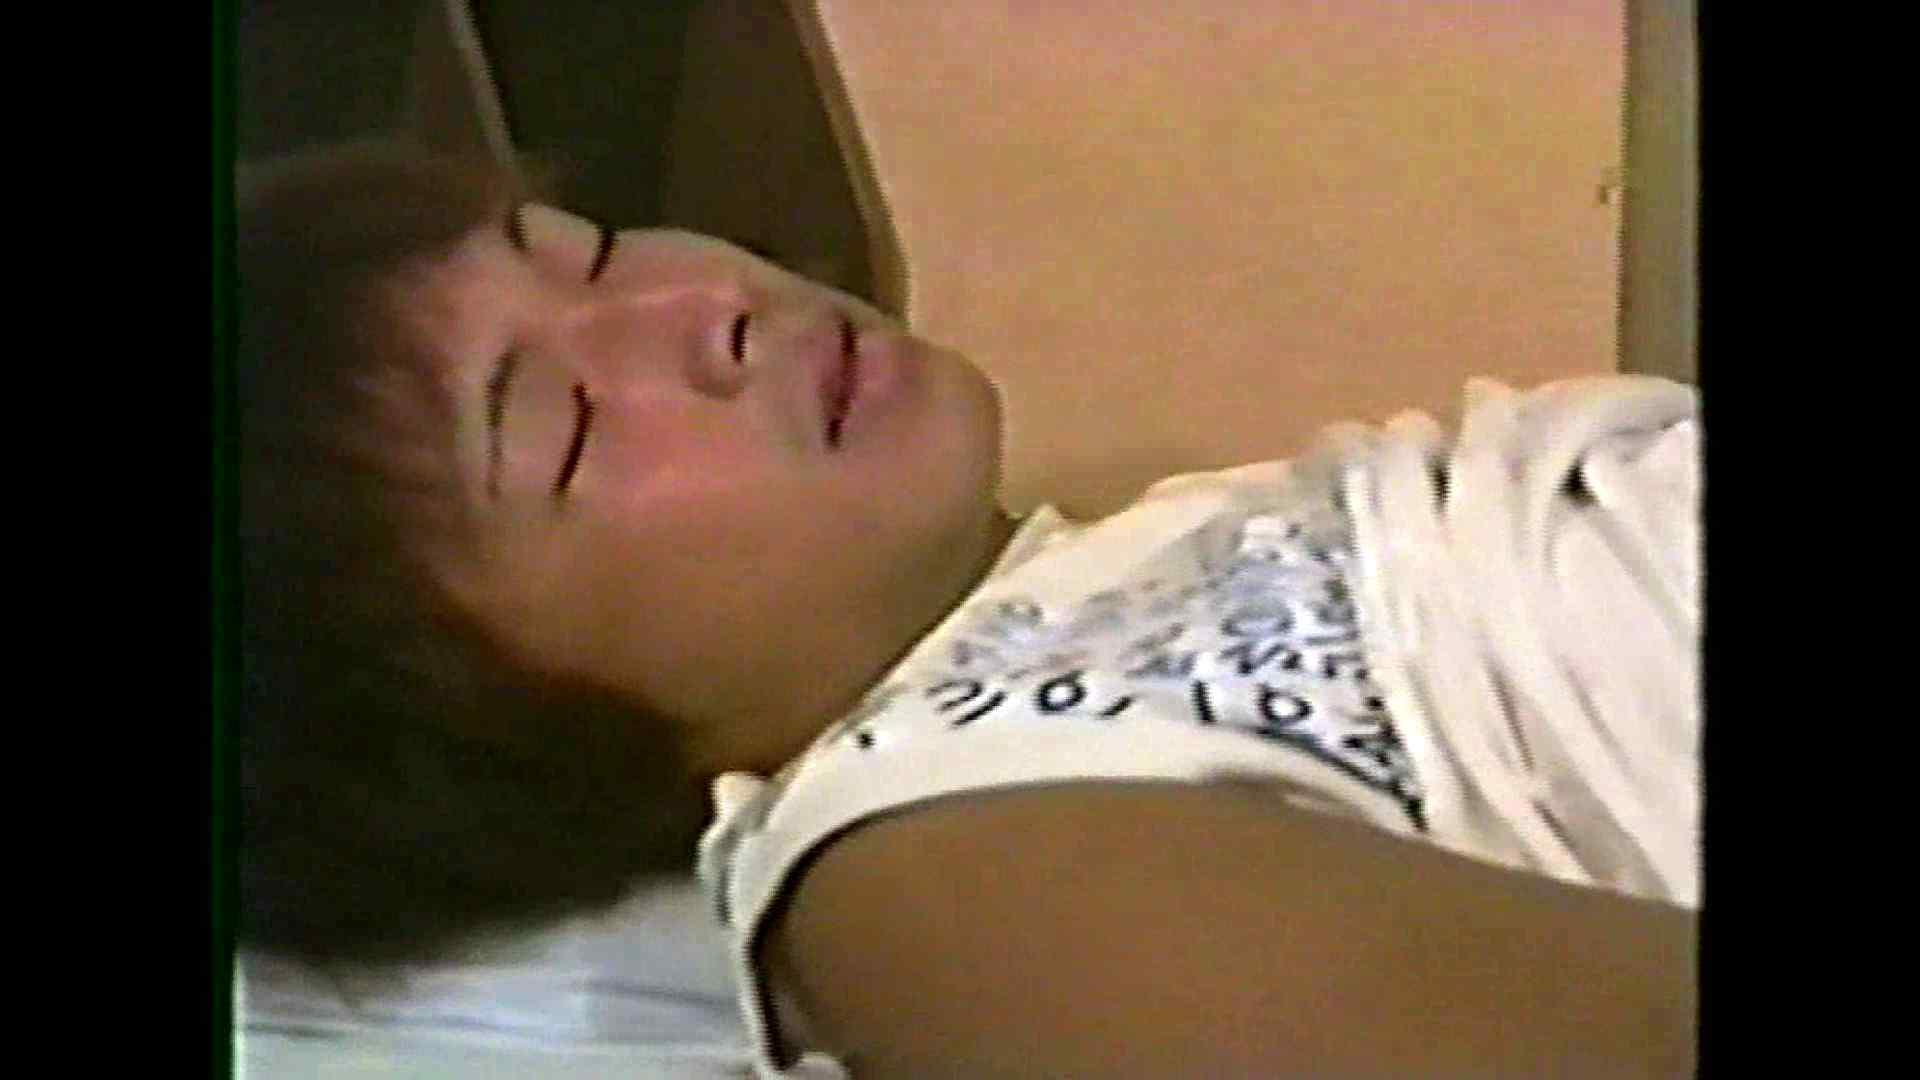 MADOKAさんのズリネタコレクションVol.3-1 ノンケのオナニー ゲイエロビデオ画像 32連発 32